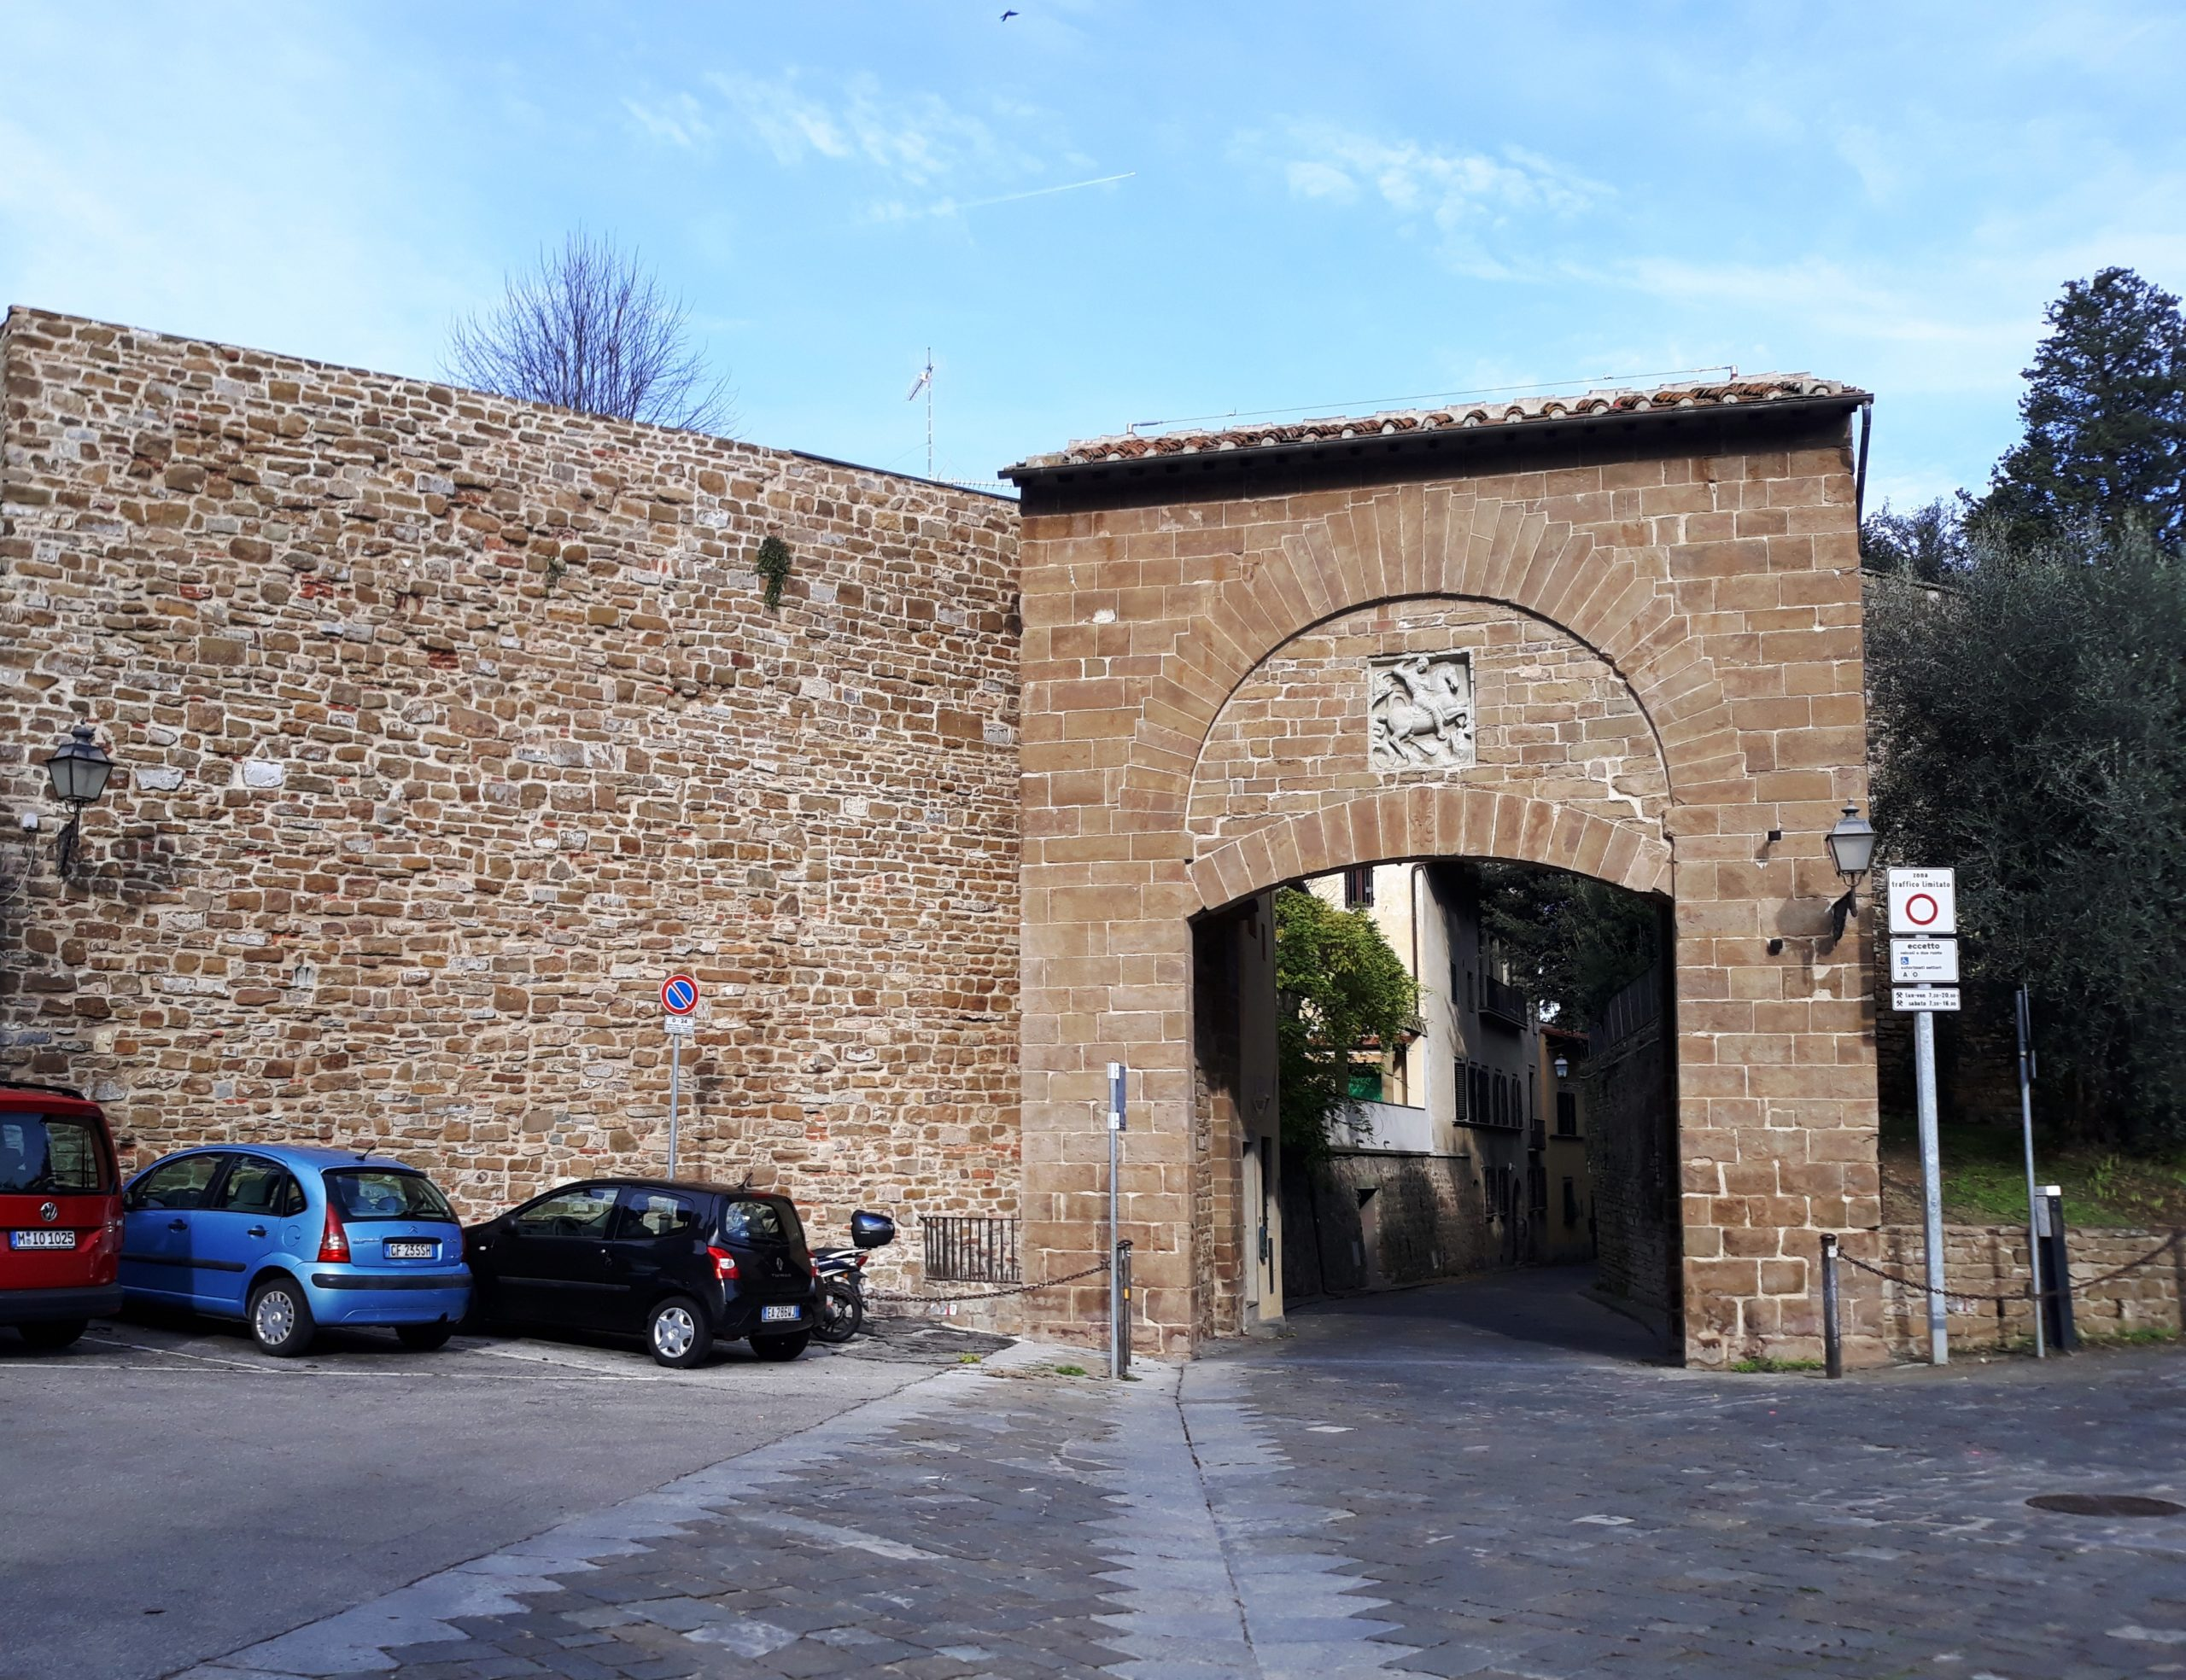 Porta San Giorgio